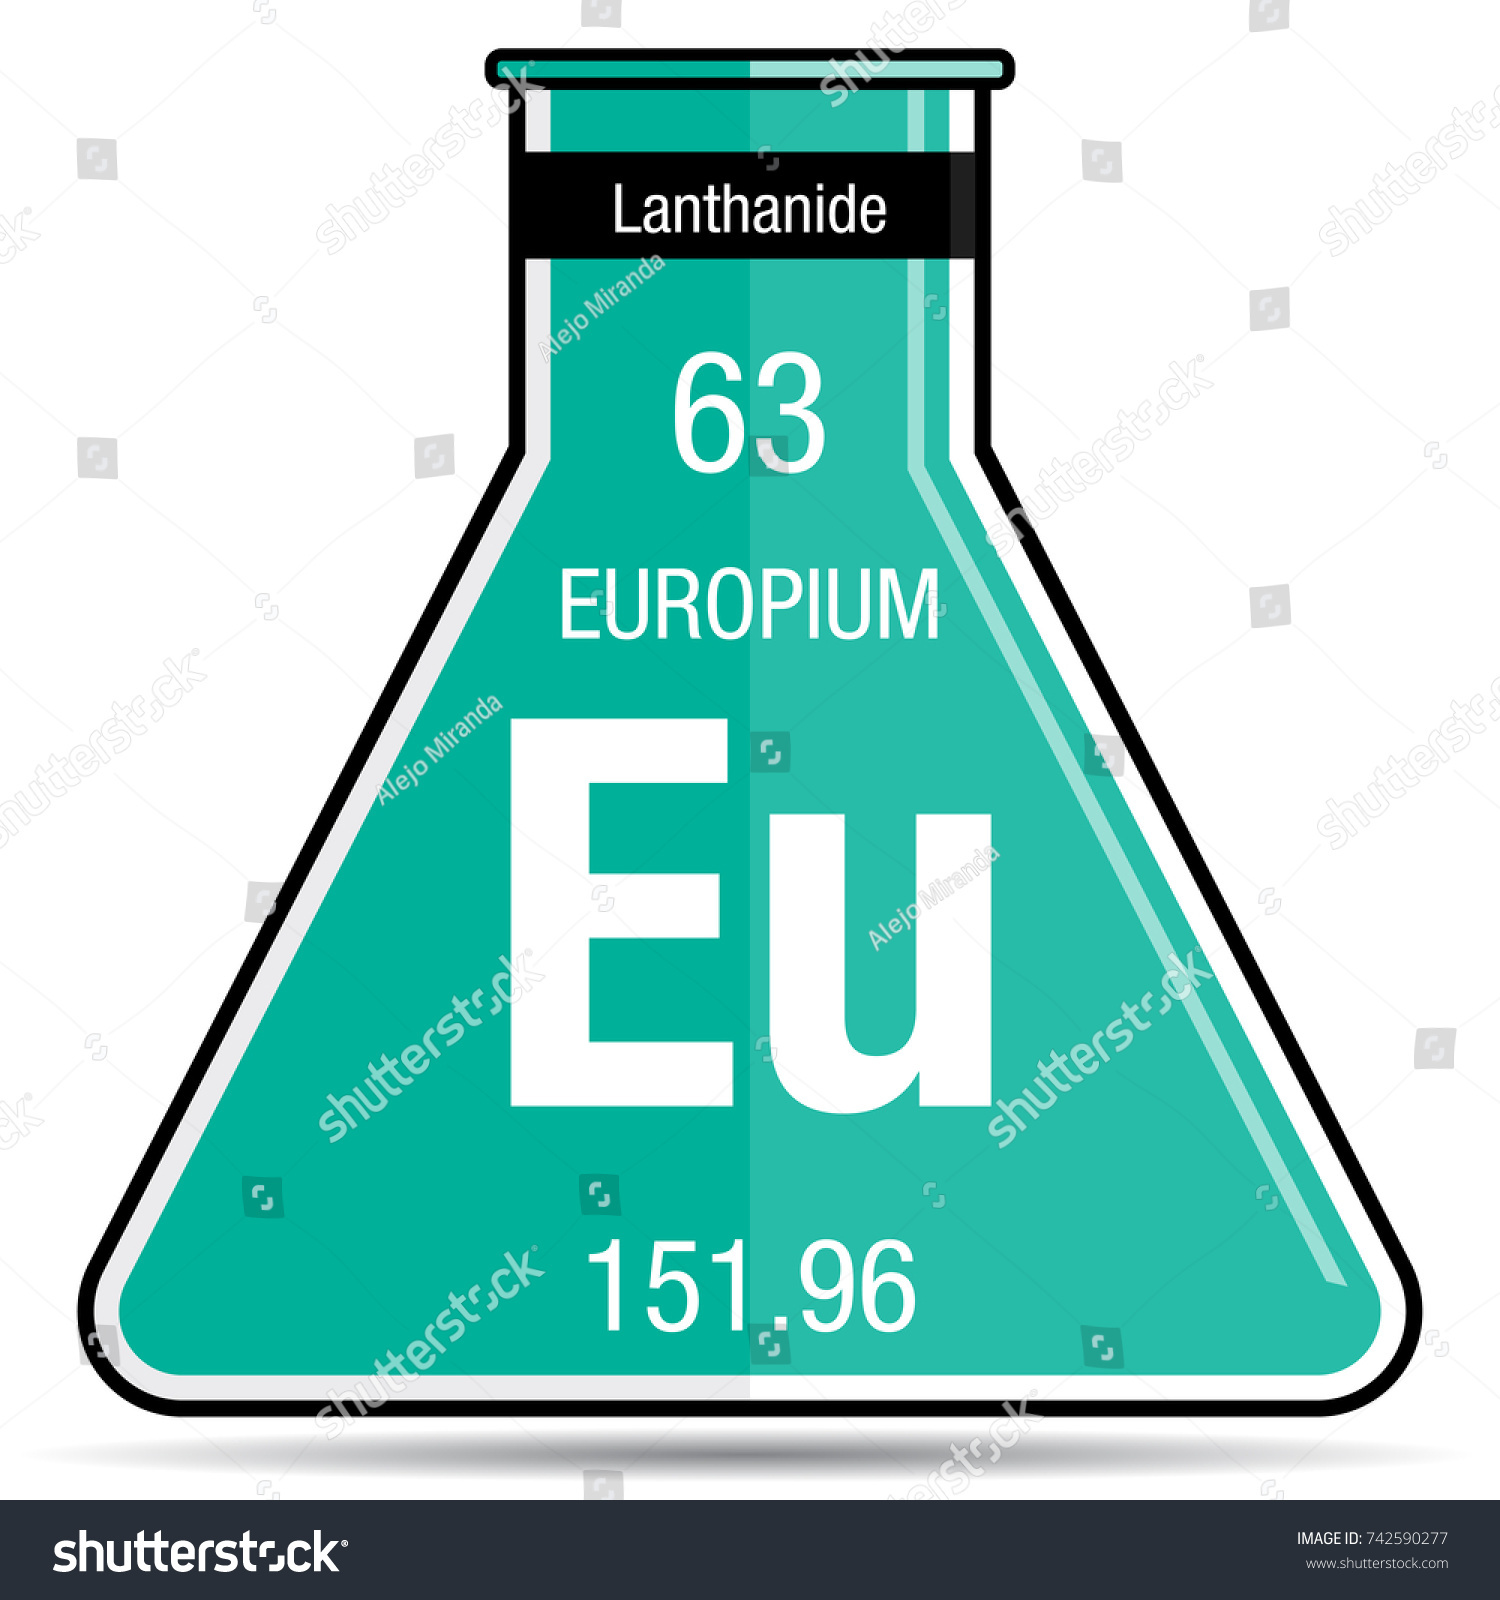 Europium Symbol On Chemical Flask Element Stock Vector (Royalty Free ...